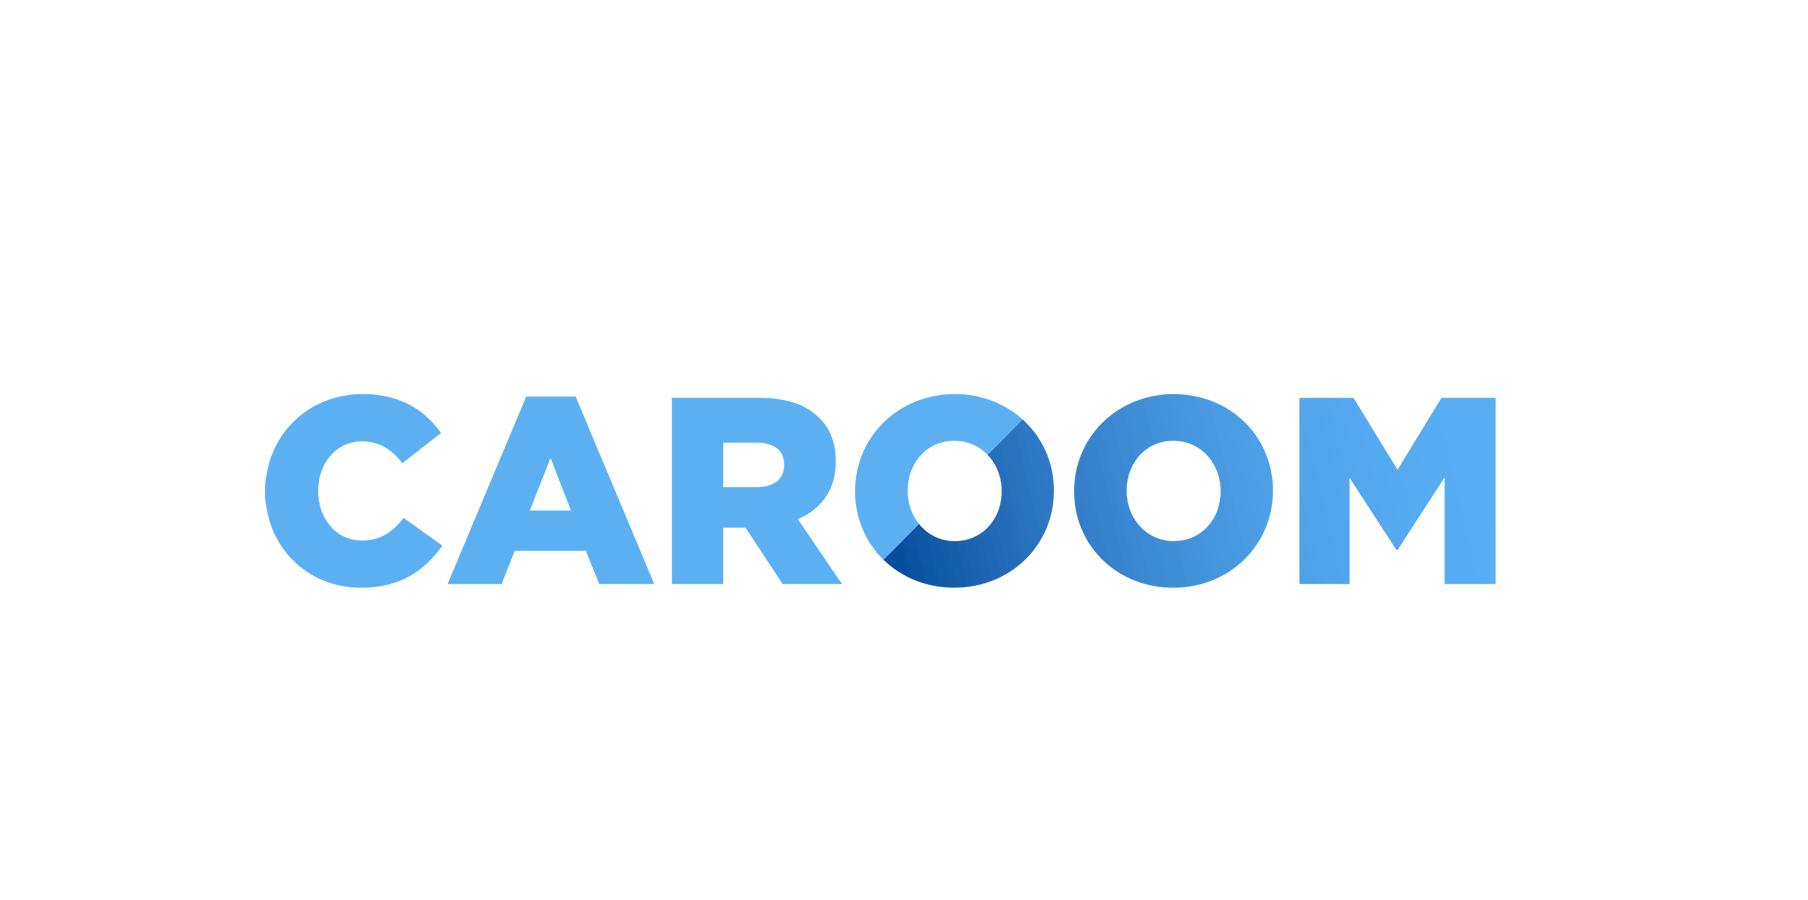 Caroom, Carrom, karoom, Karoum, Karoom, Caroum